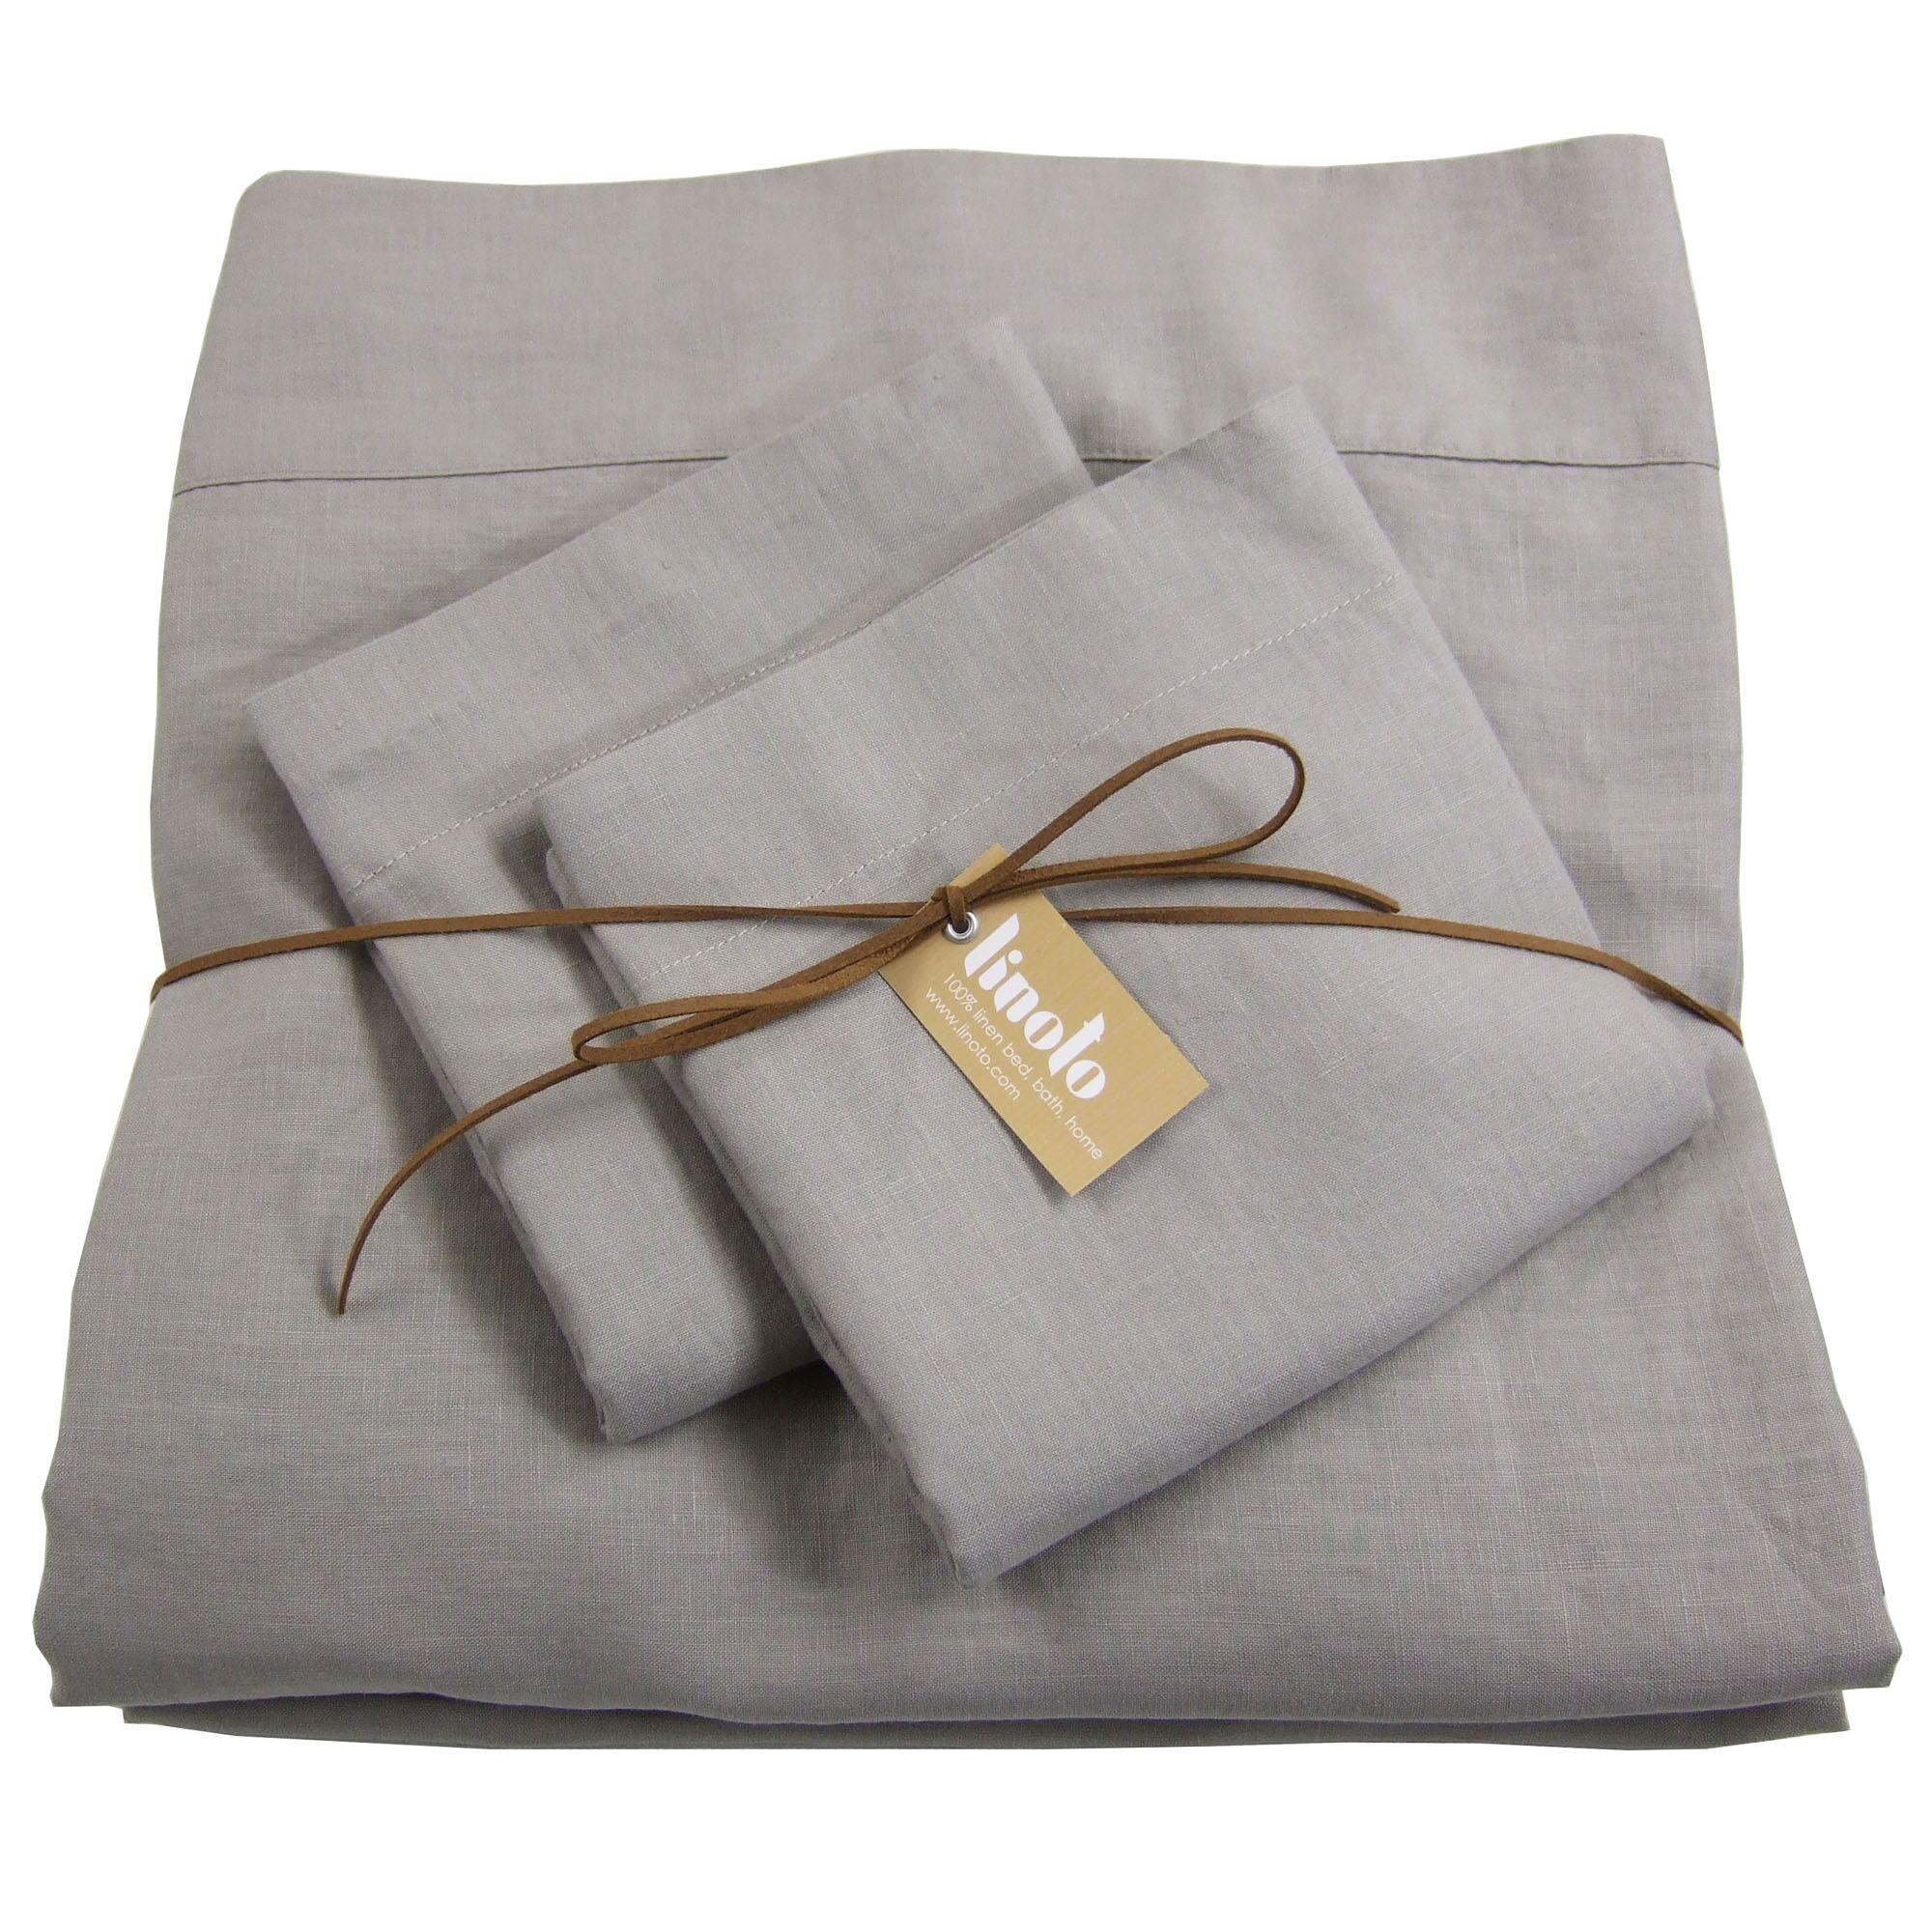 Linen Sheet Set Color: Warm Gray, Size: Queen